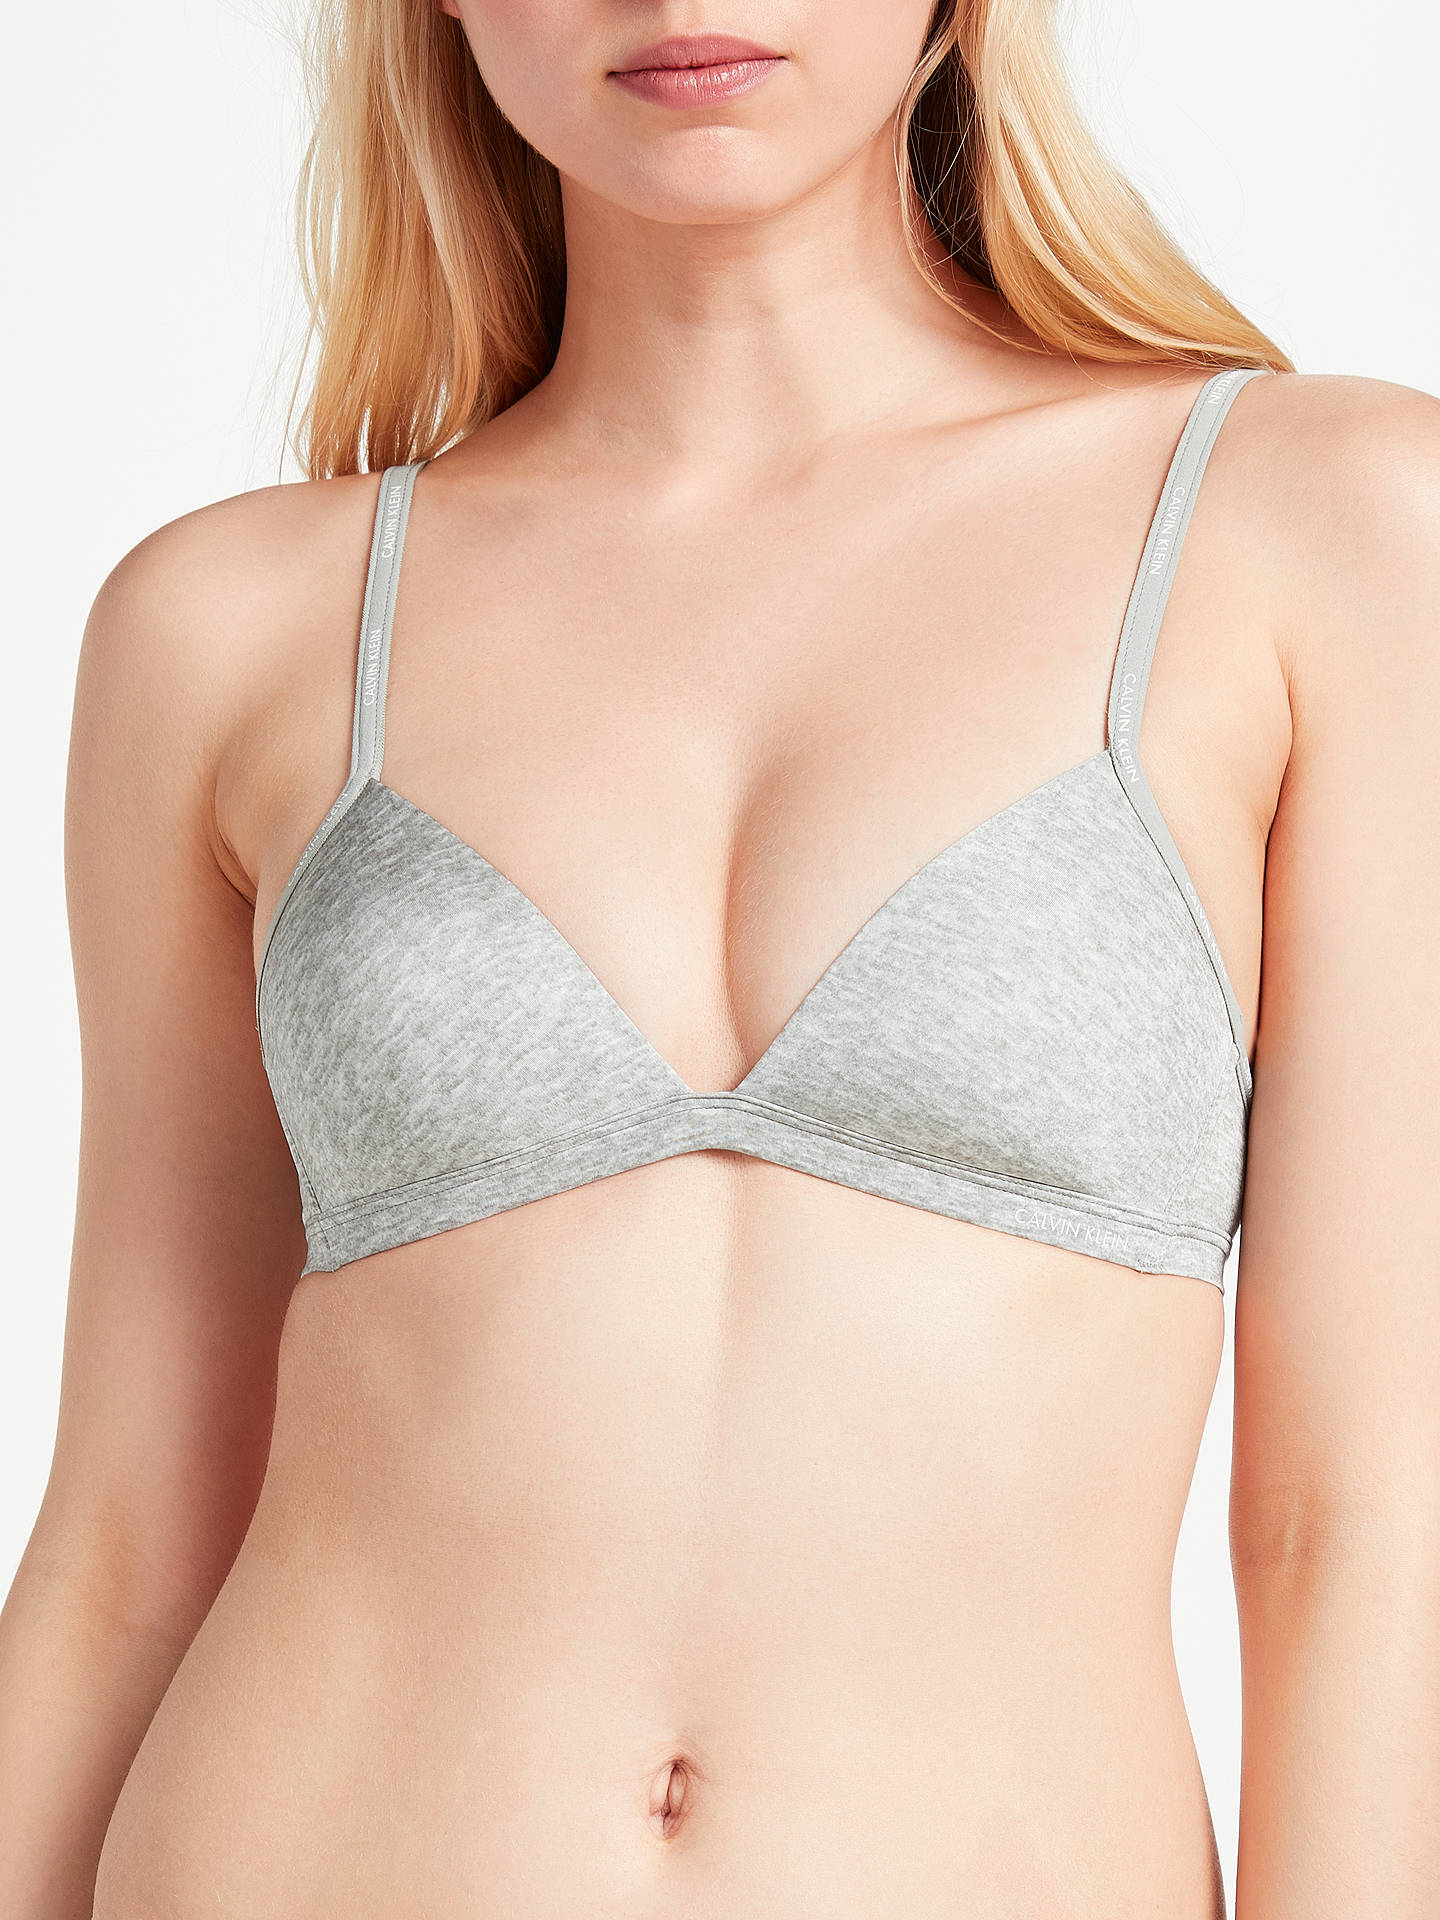 BuyCalvin Klein Underwear Youthful Lined Triangle Bra 2bf573fc2